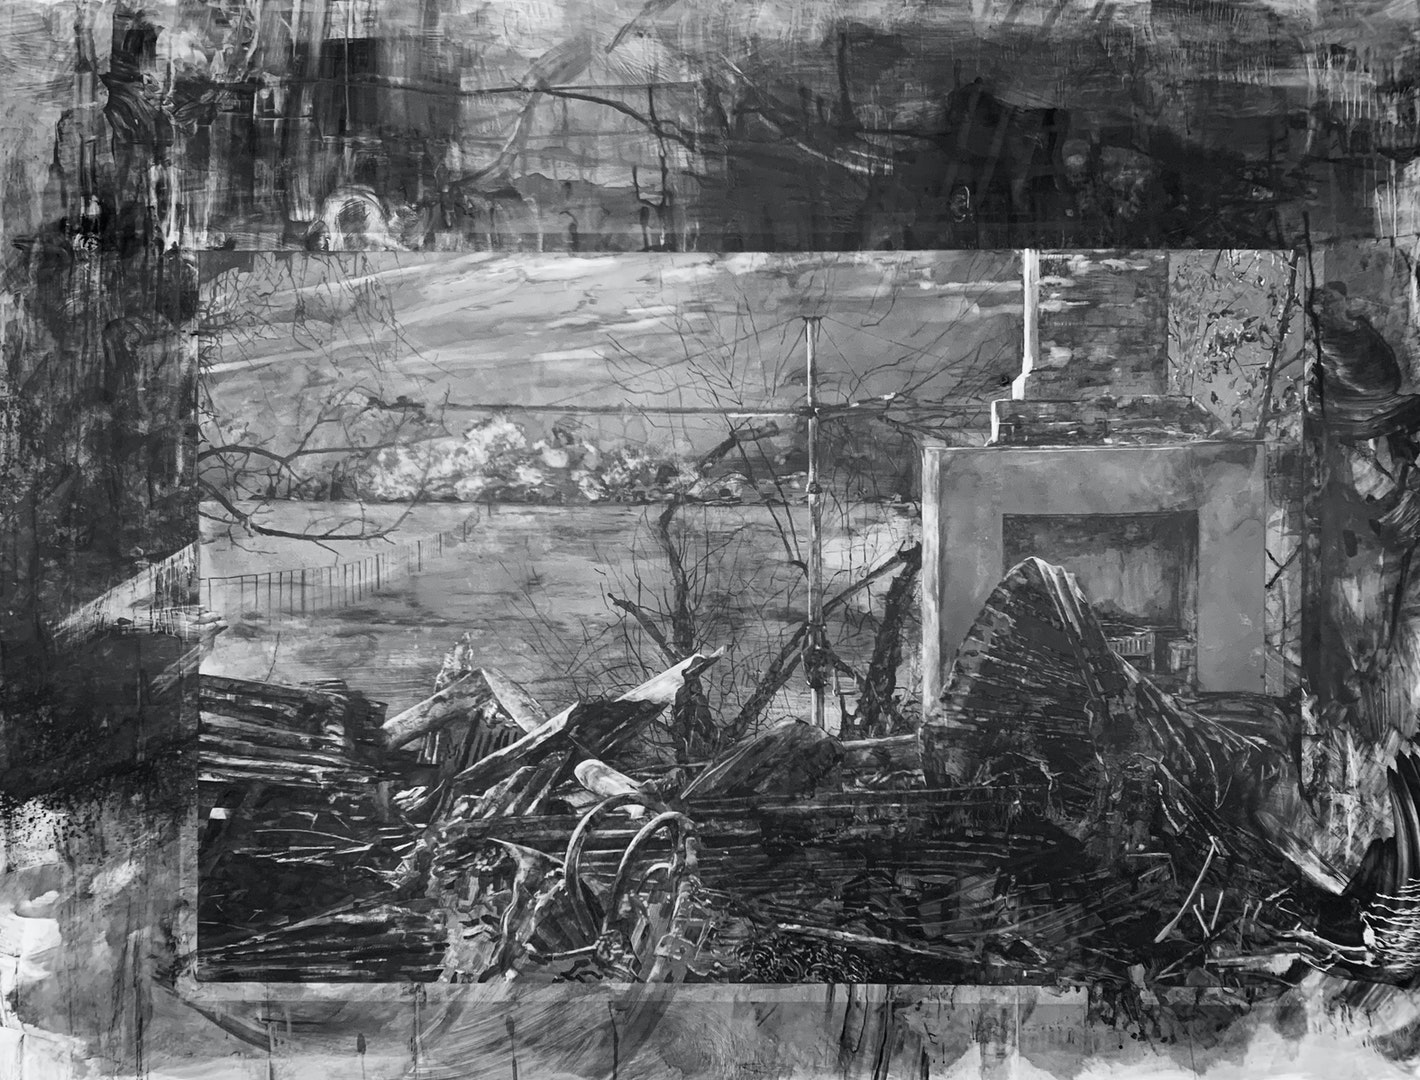 'Cudgewa', Melody Spangaro, Water soluble graphite on plastic, 136 x 175 cm